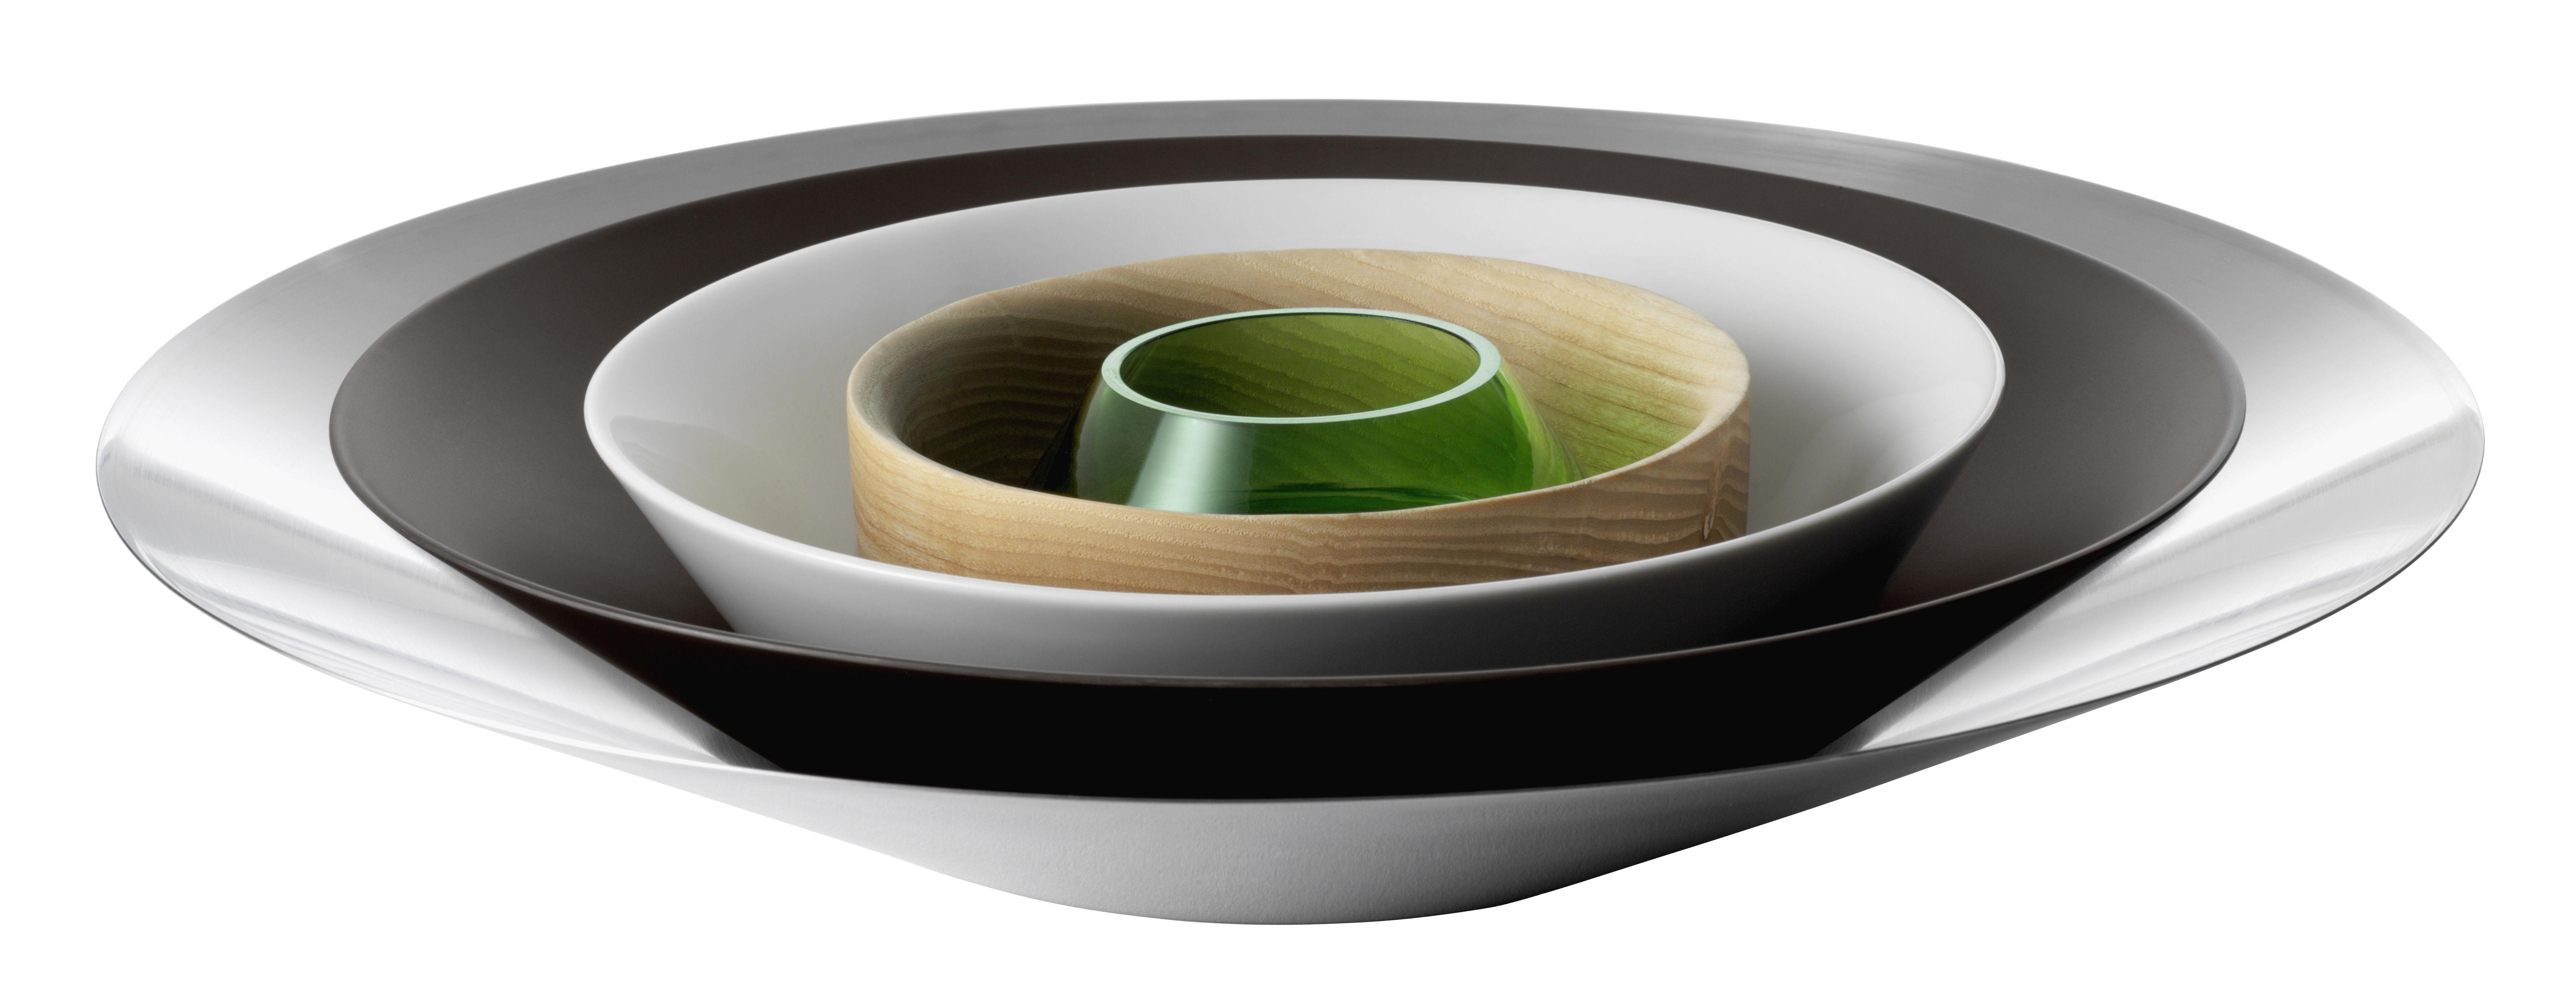 Bowl Bowls By Design House Stockholm